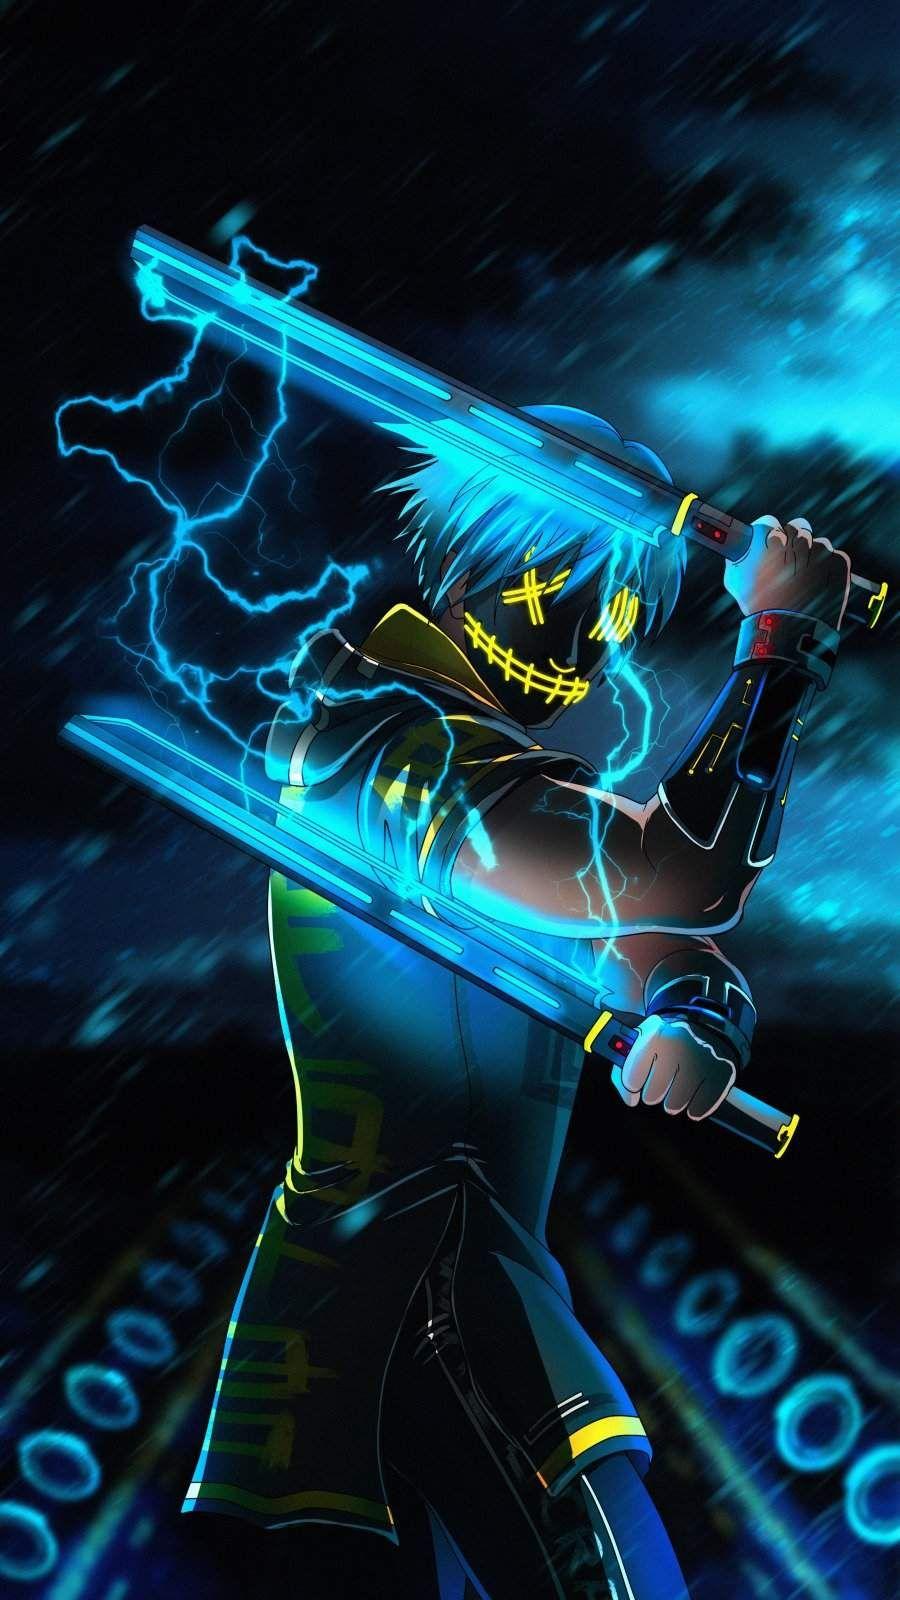 Sword Master Anime iPhone Wallpaper - iPhone Wallpapers